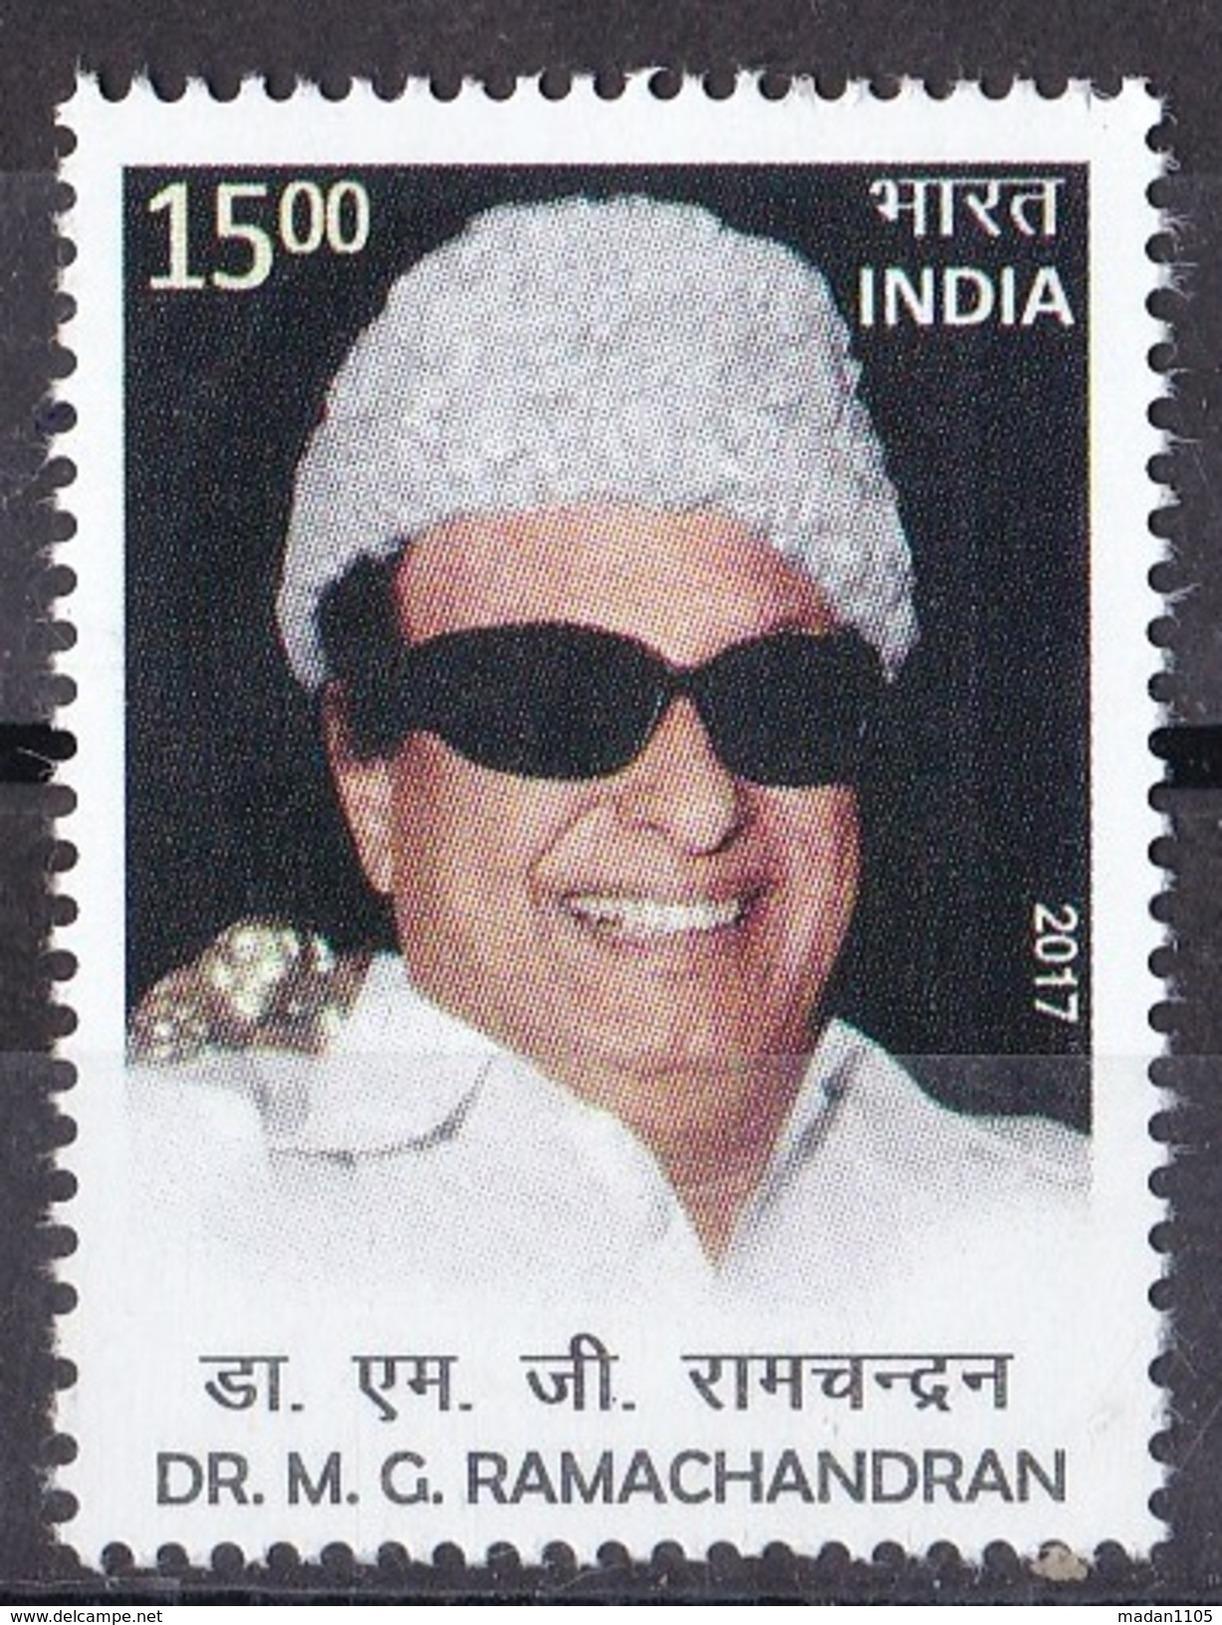 INDIA, 2017, M G Ramachandran, Actor, Politician, MNH, (**) - India